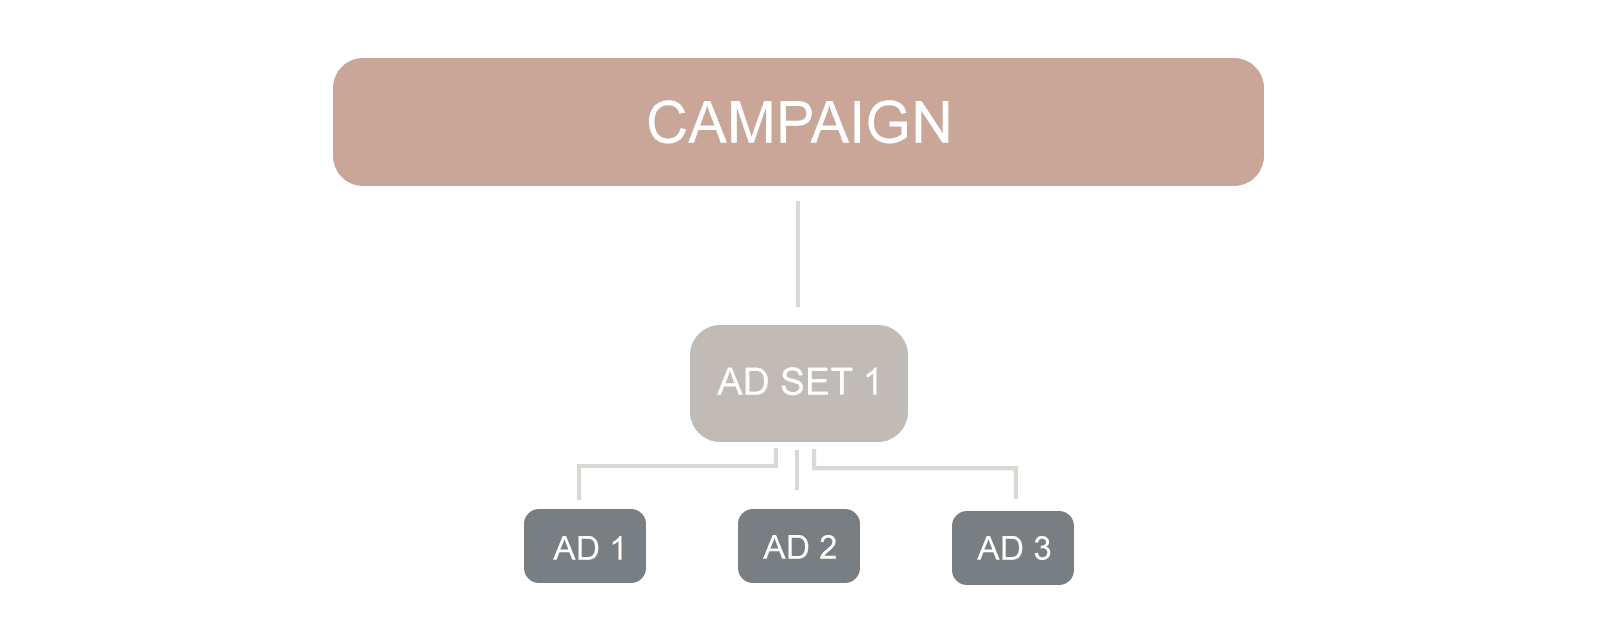 Facebook ads A/B testing